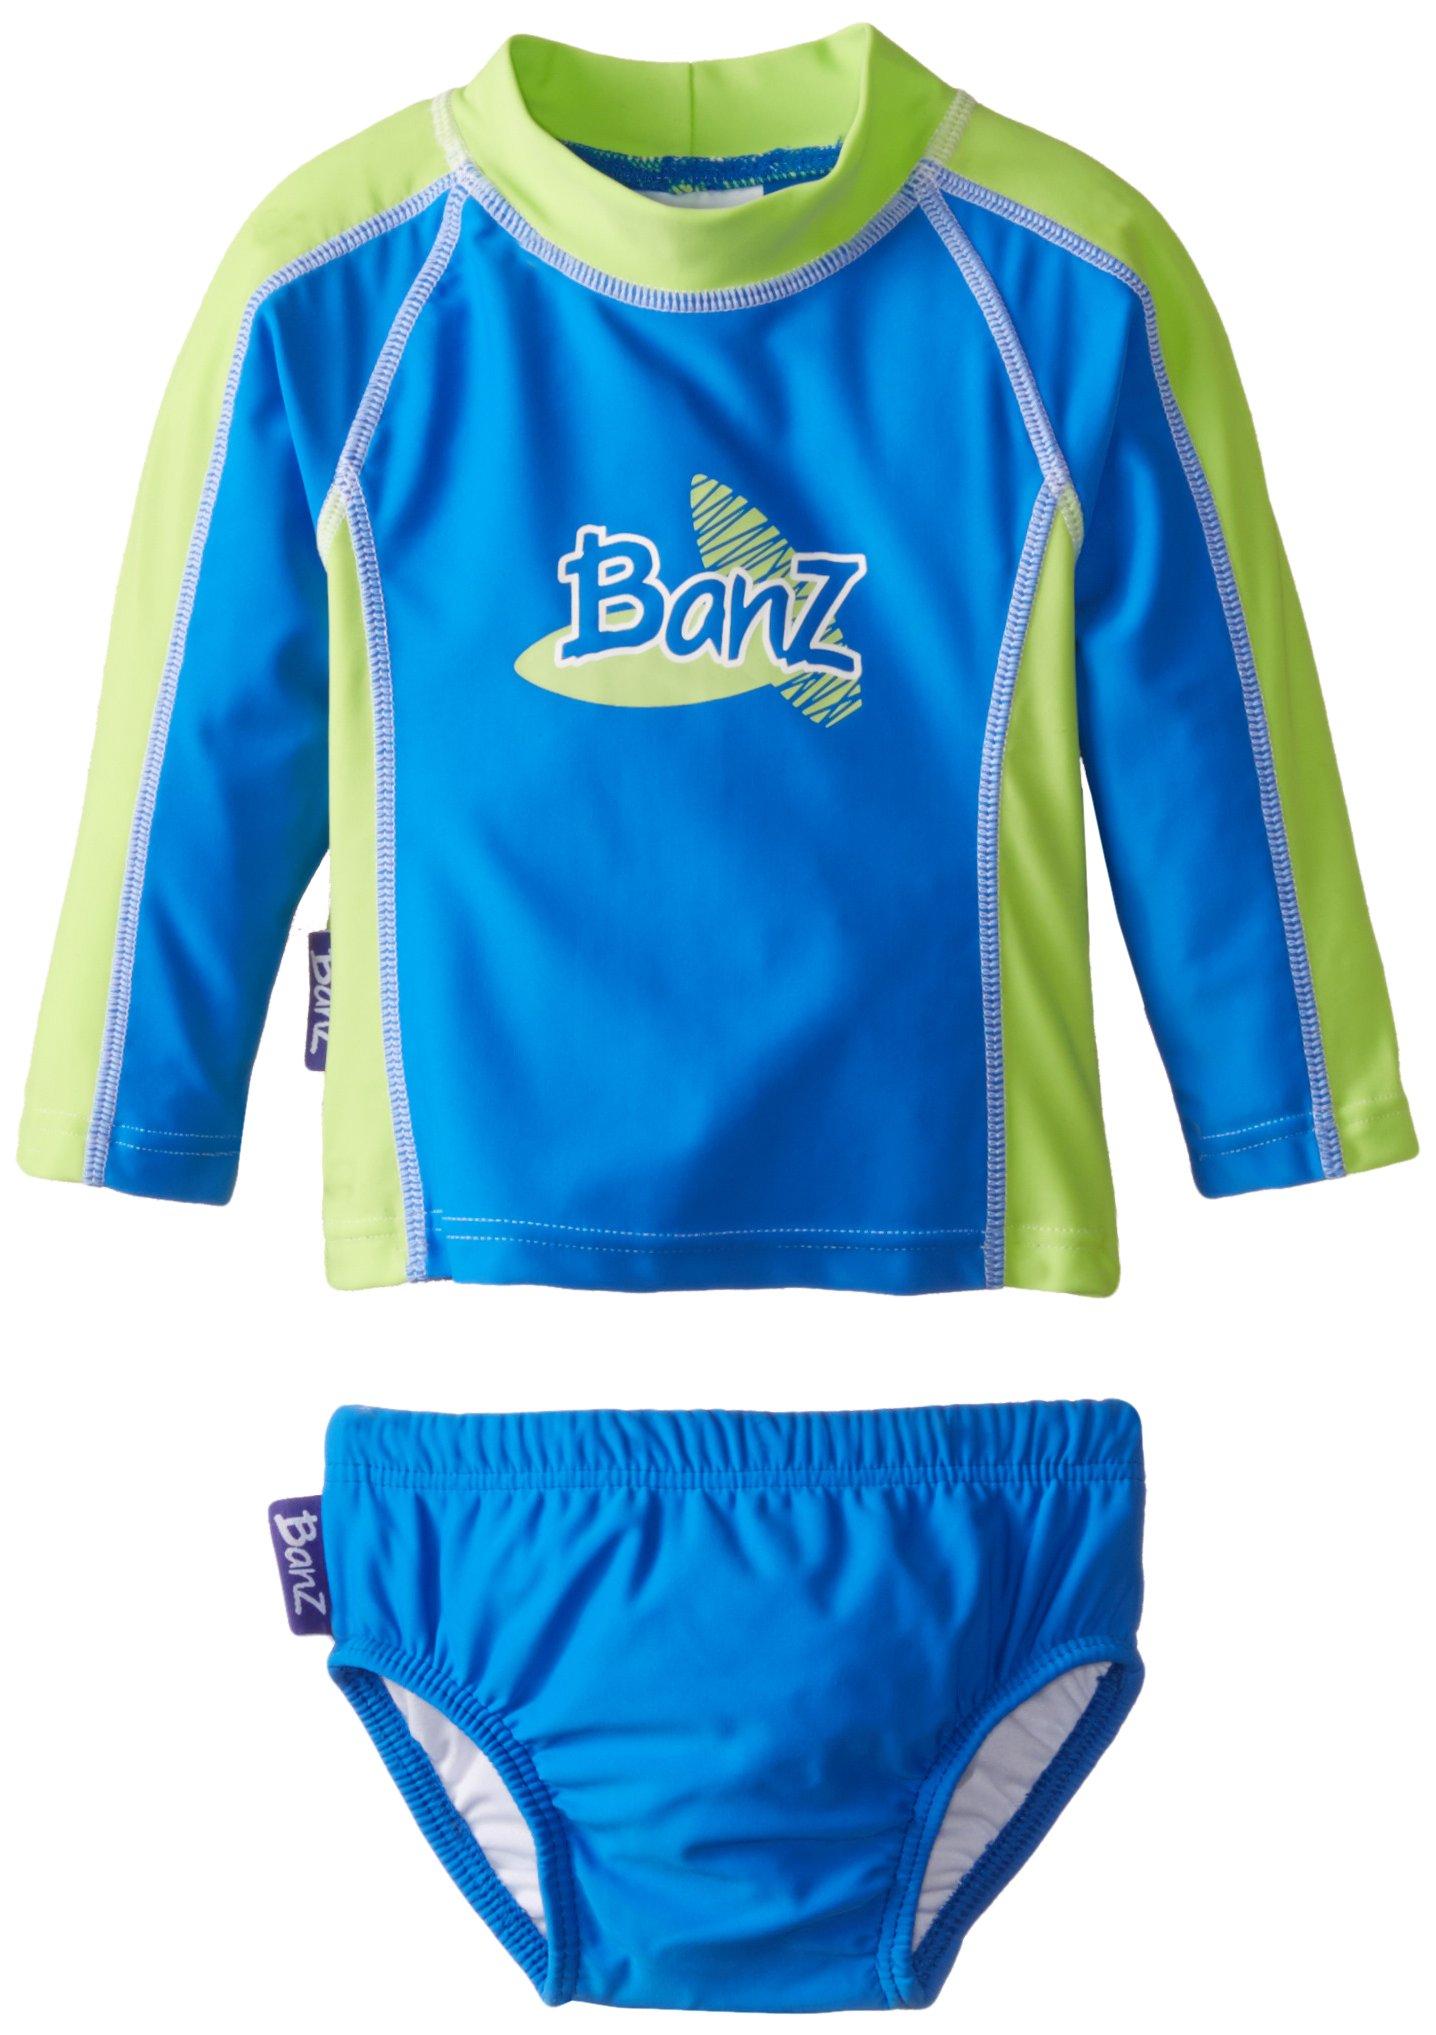 Baby Banz Baby Boys' Long Sleeve Rash Guard and Swim Diaper Set Blue Green, Blue/Green, 6 12 Months by Baby Banz